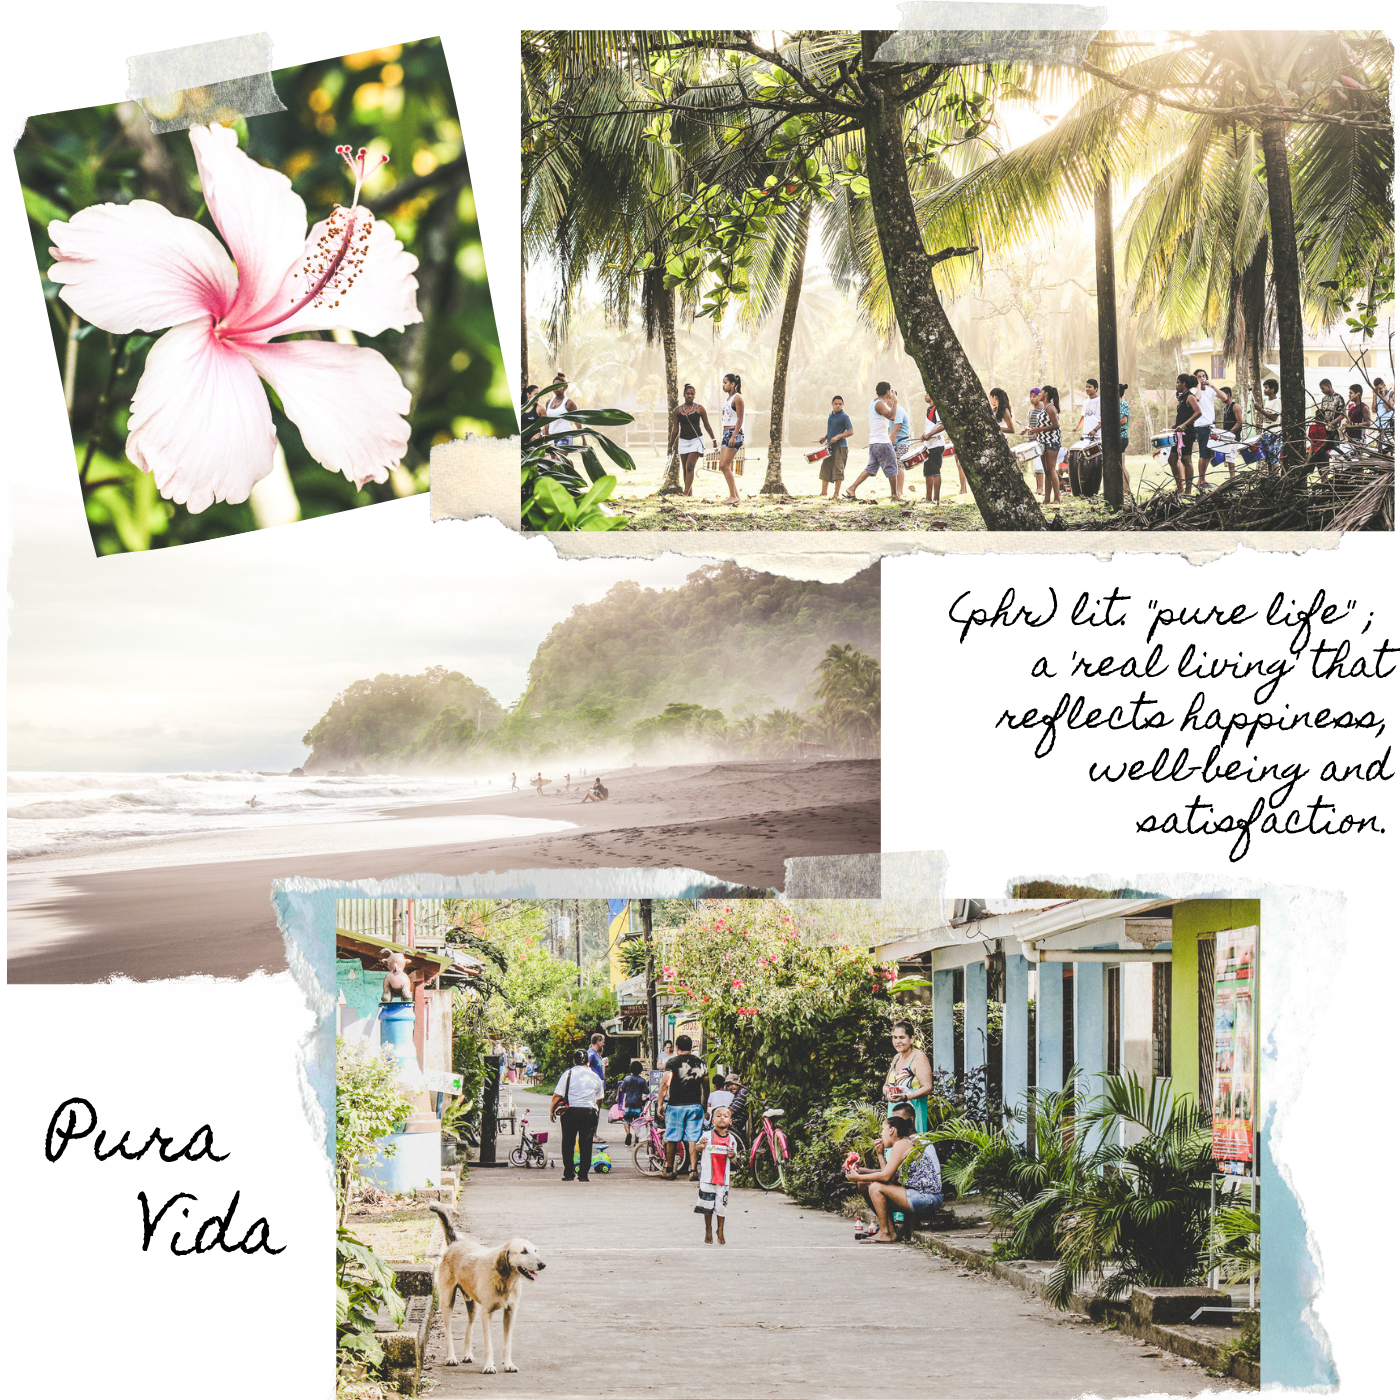 Bedeutung von Pura Vida Costa Rica